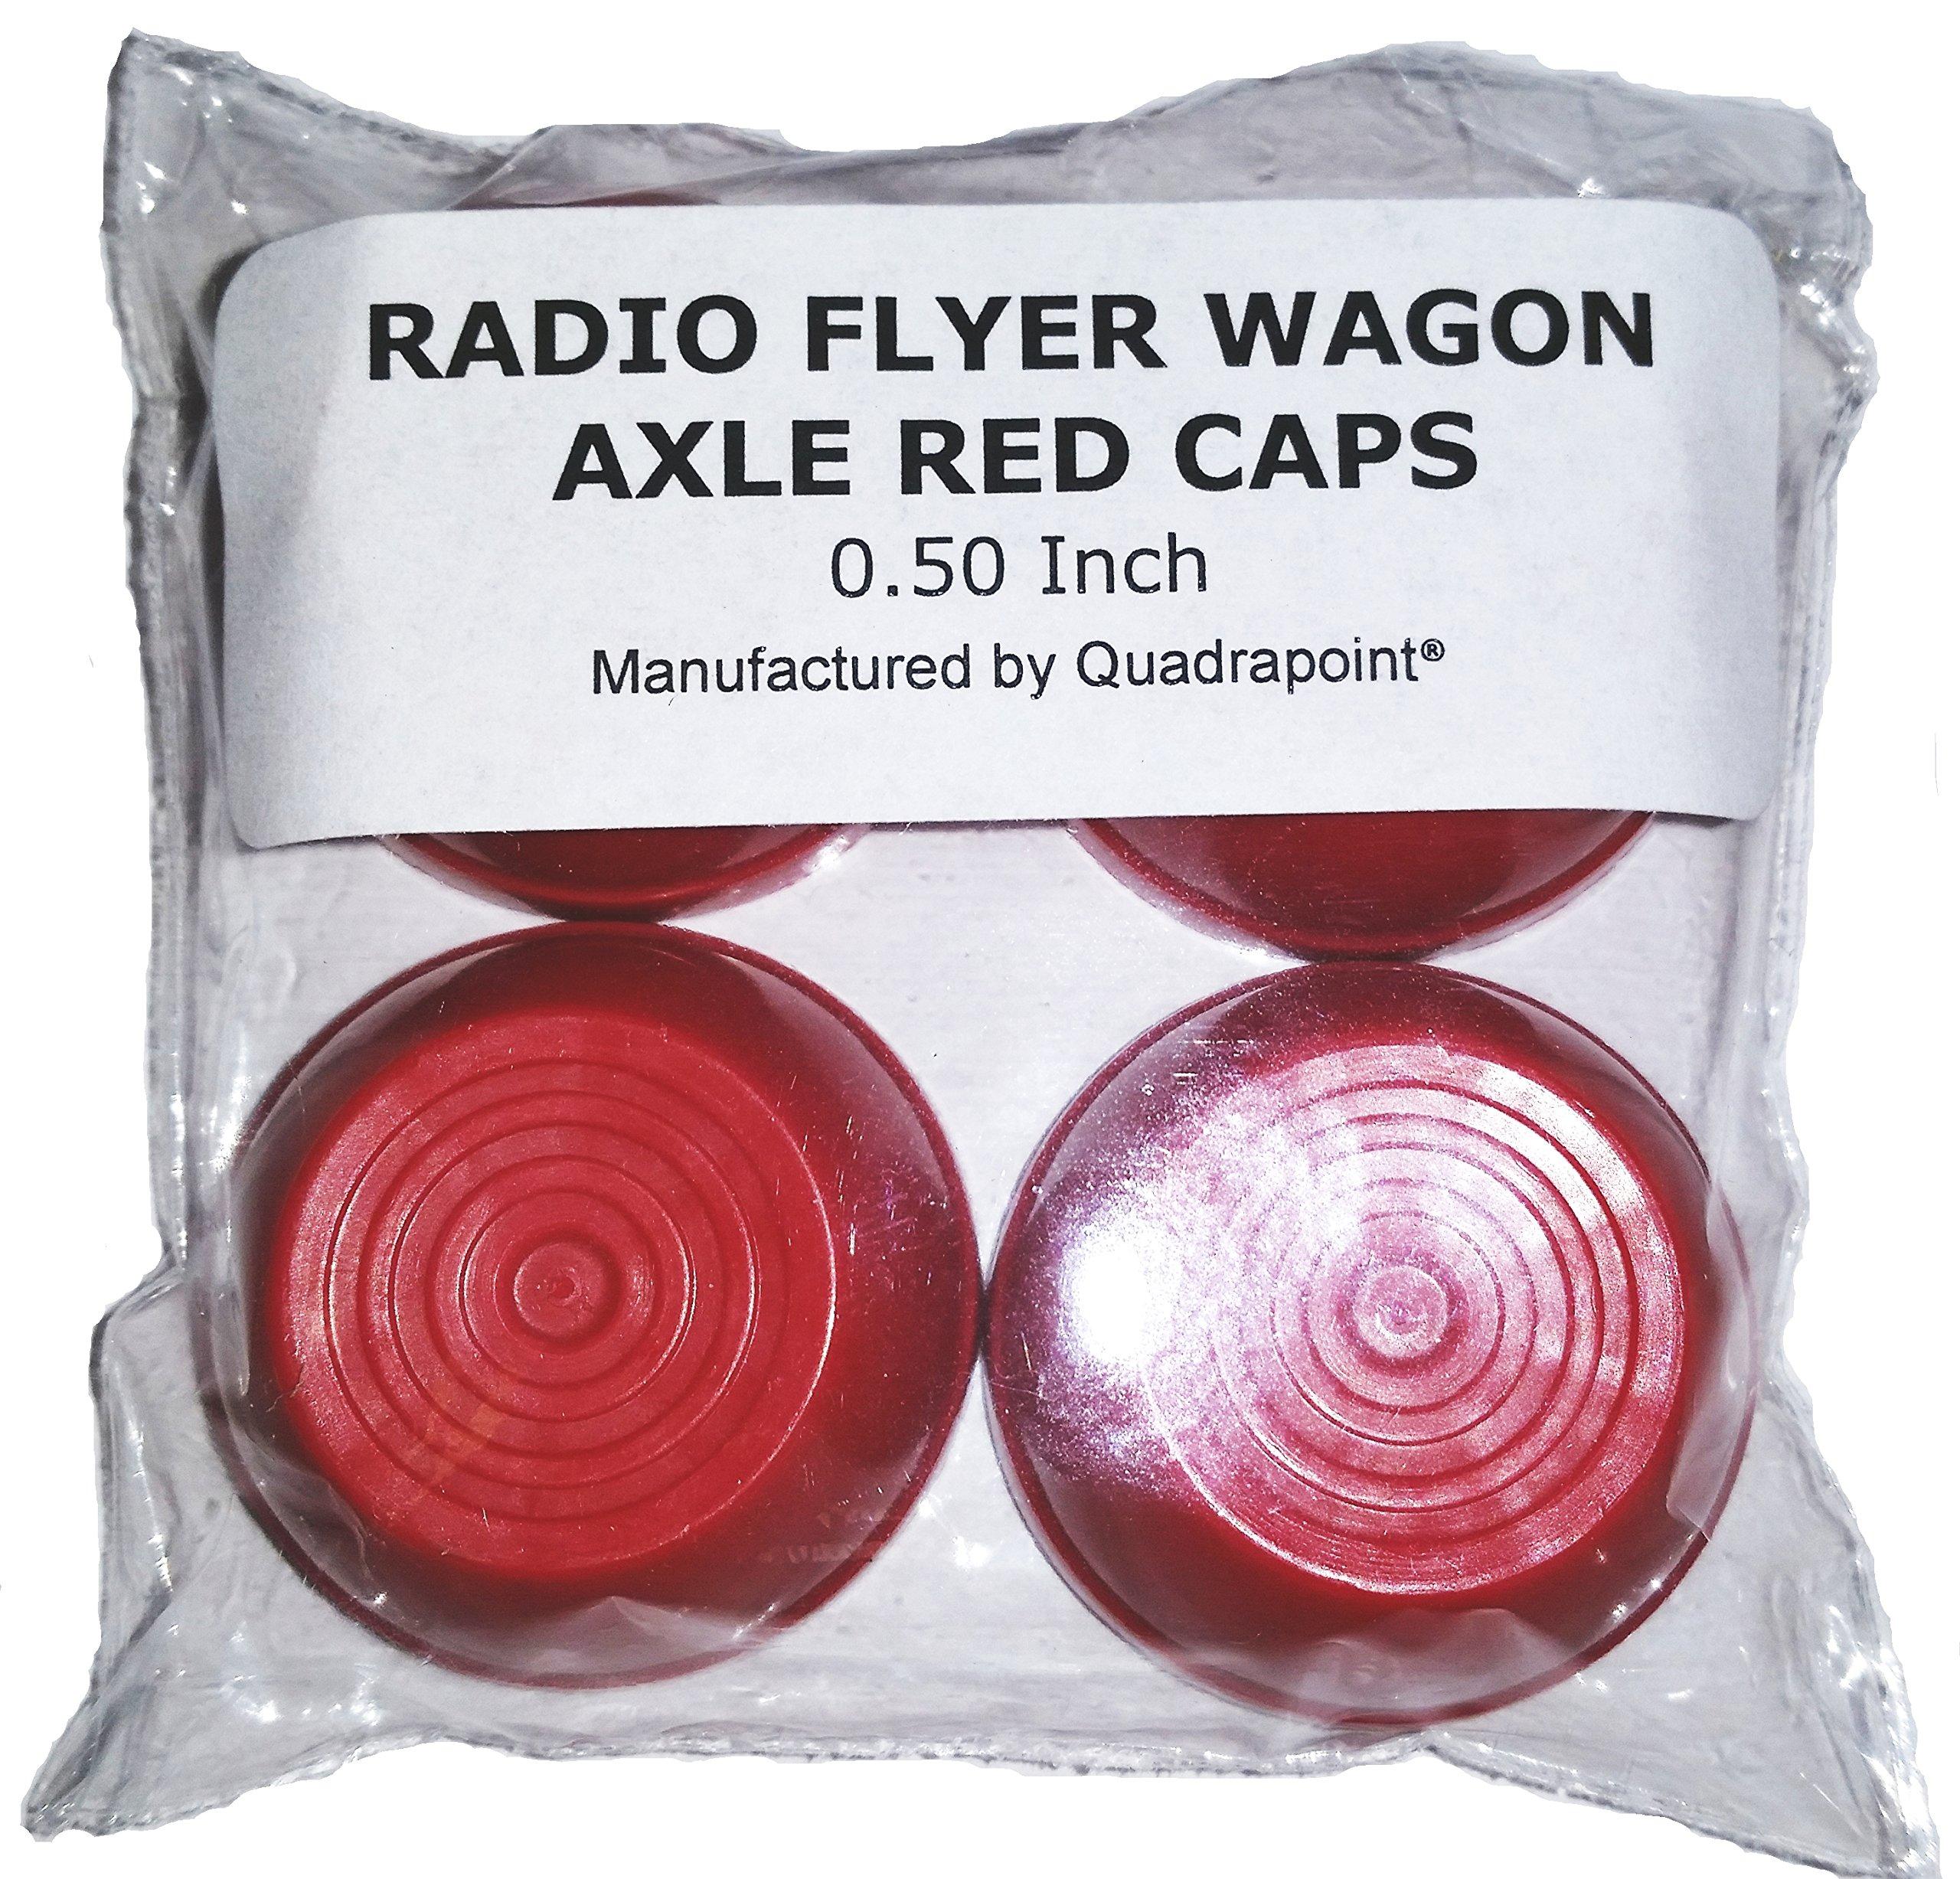 Quadrapoint Radio Flyer Large Wheel Caps 0.50'' RED, PARTS